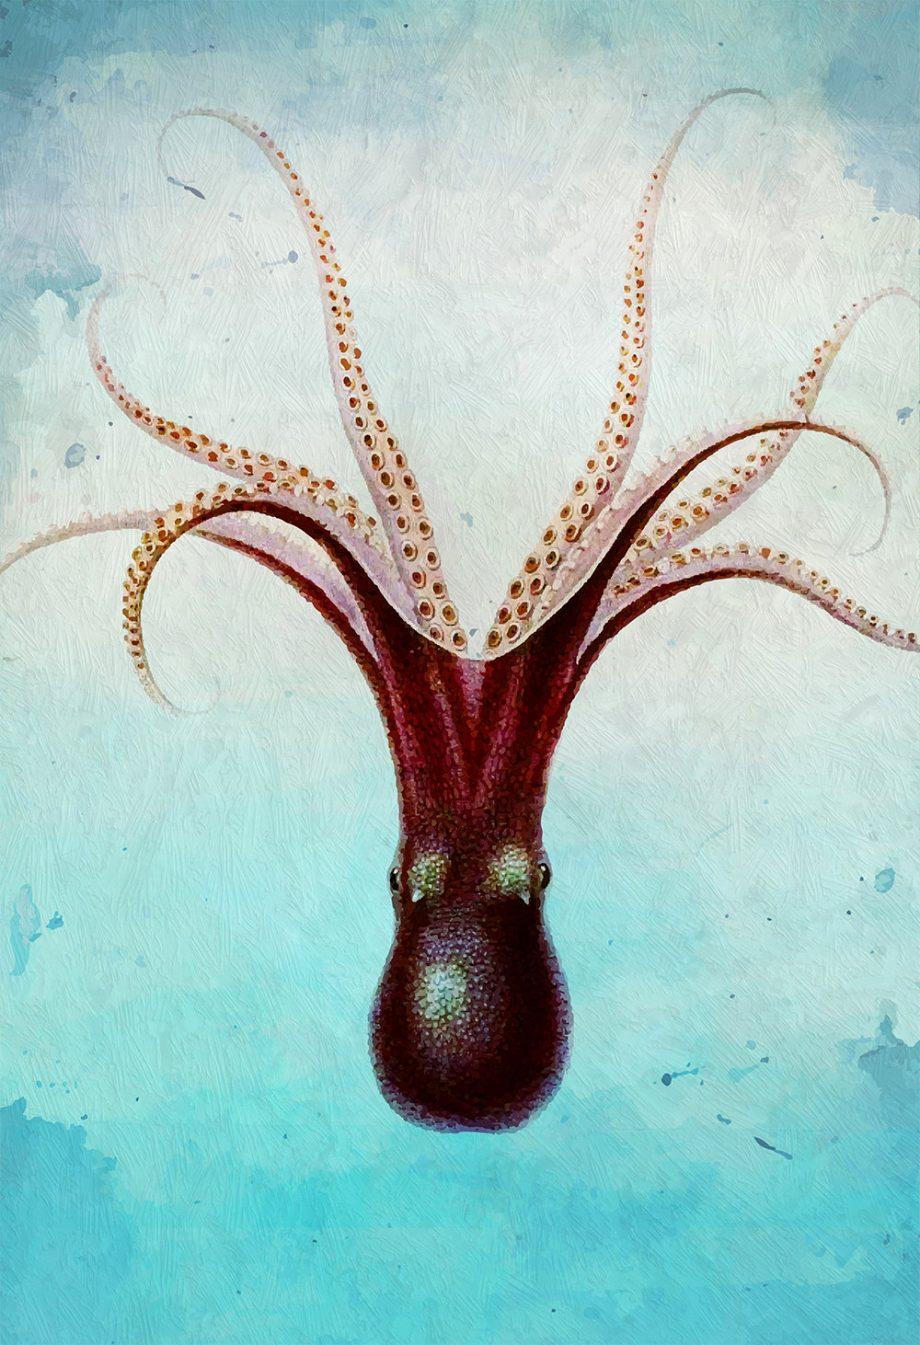 Octopus Art Print Sea Squid Vintage Nautical Decor Ocean Wall Art Giclee Print on Cotton Canvas and Satin